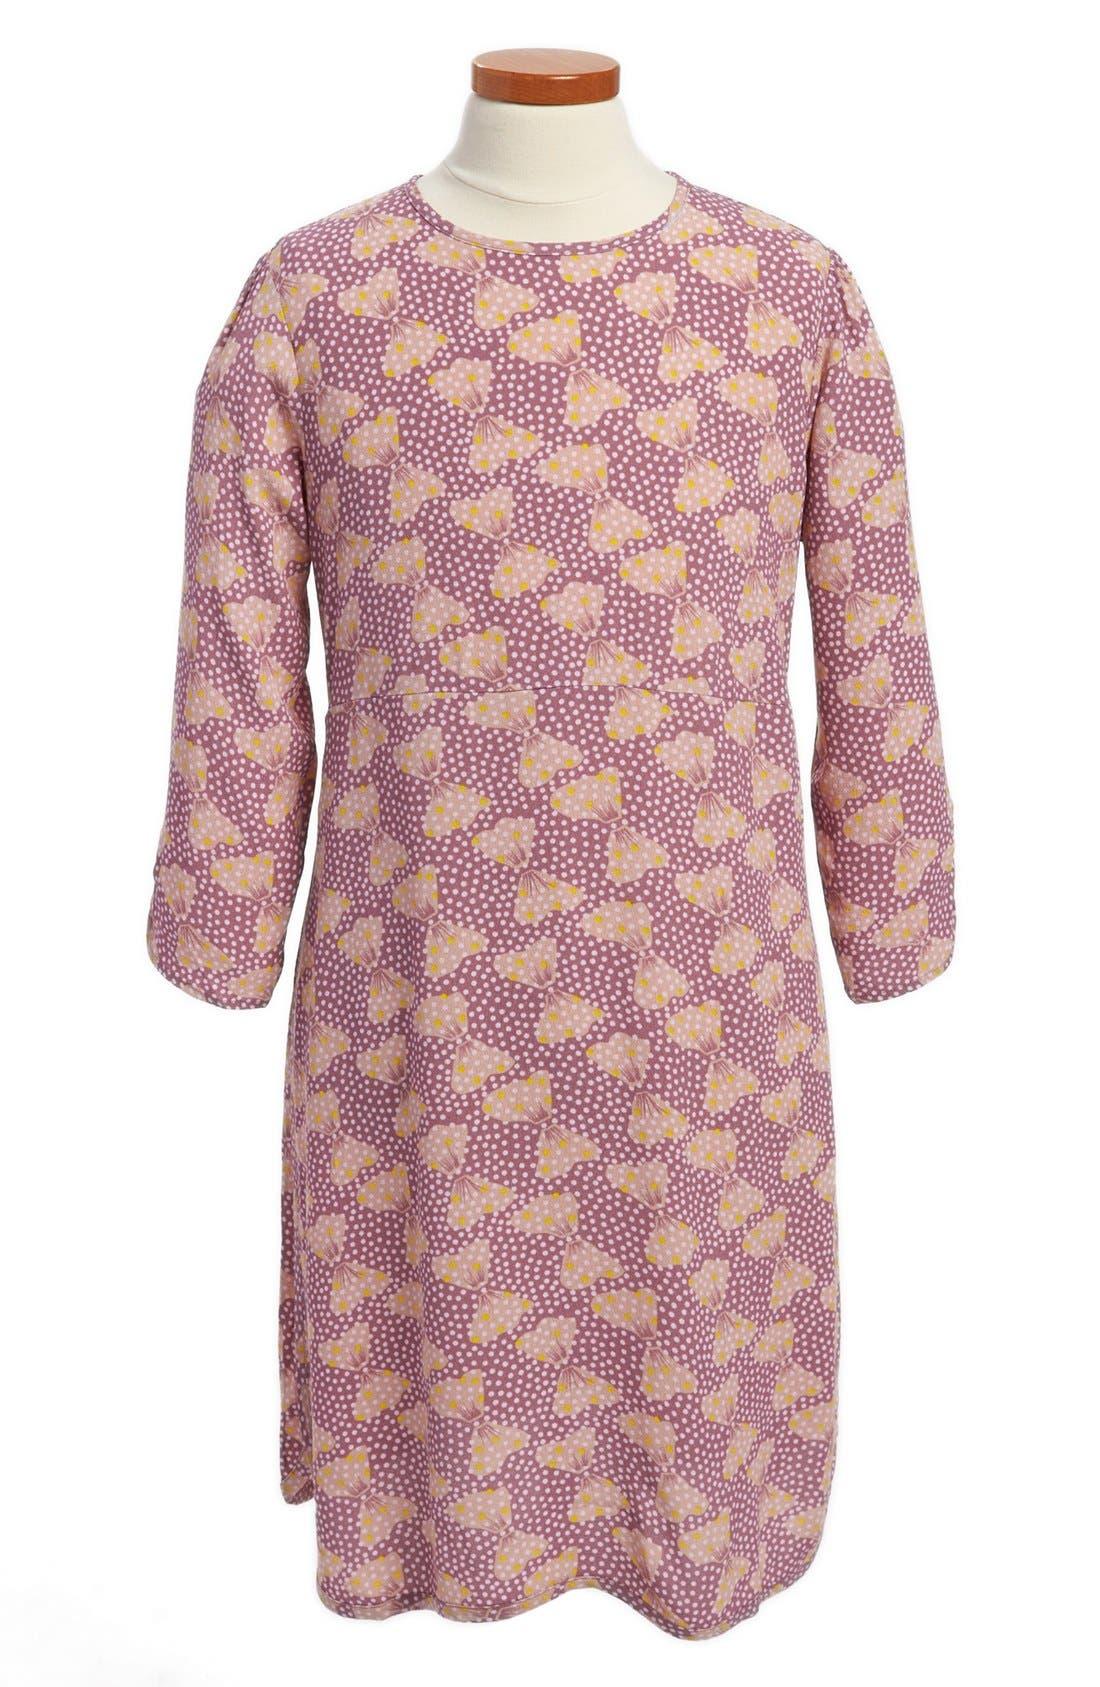 Alternate Image 1 Selected - Stella McCartney Kids 'Ida' Bow Print Dress (Toddler, Little Girls & Big Girls)